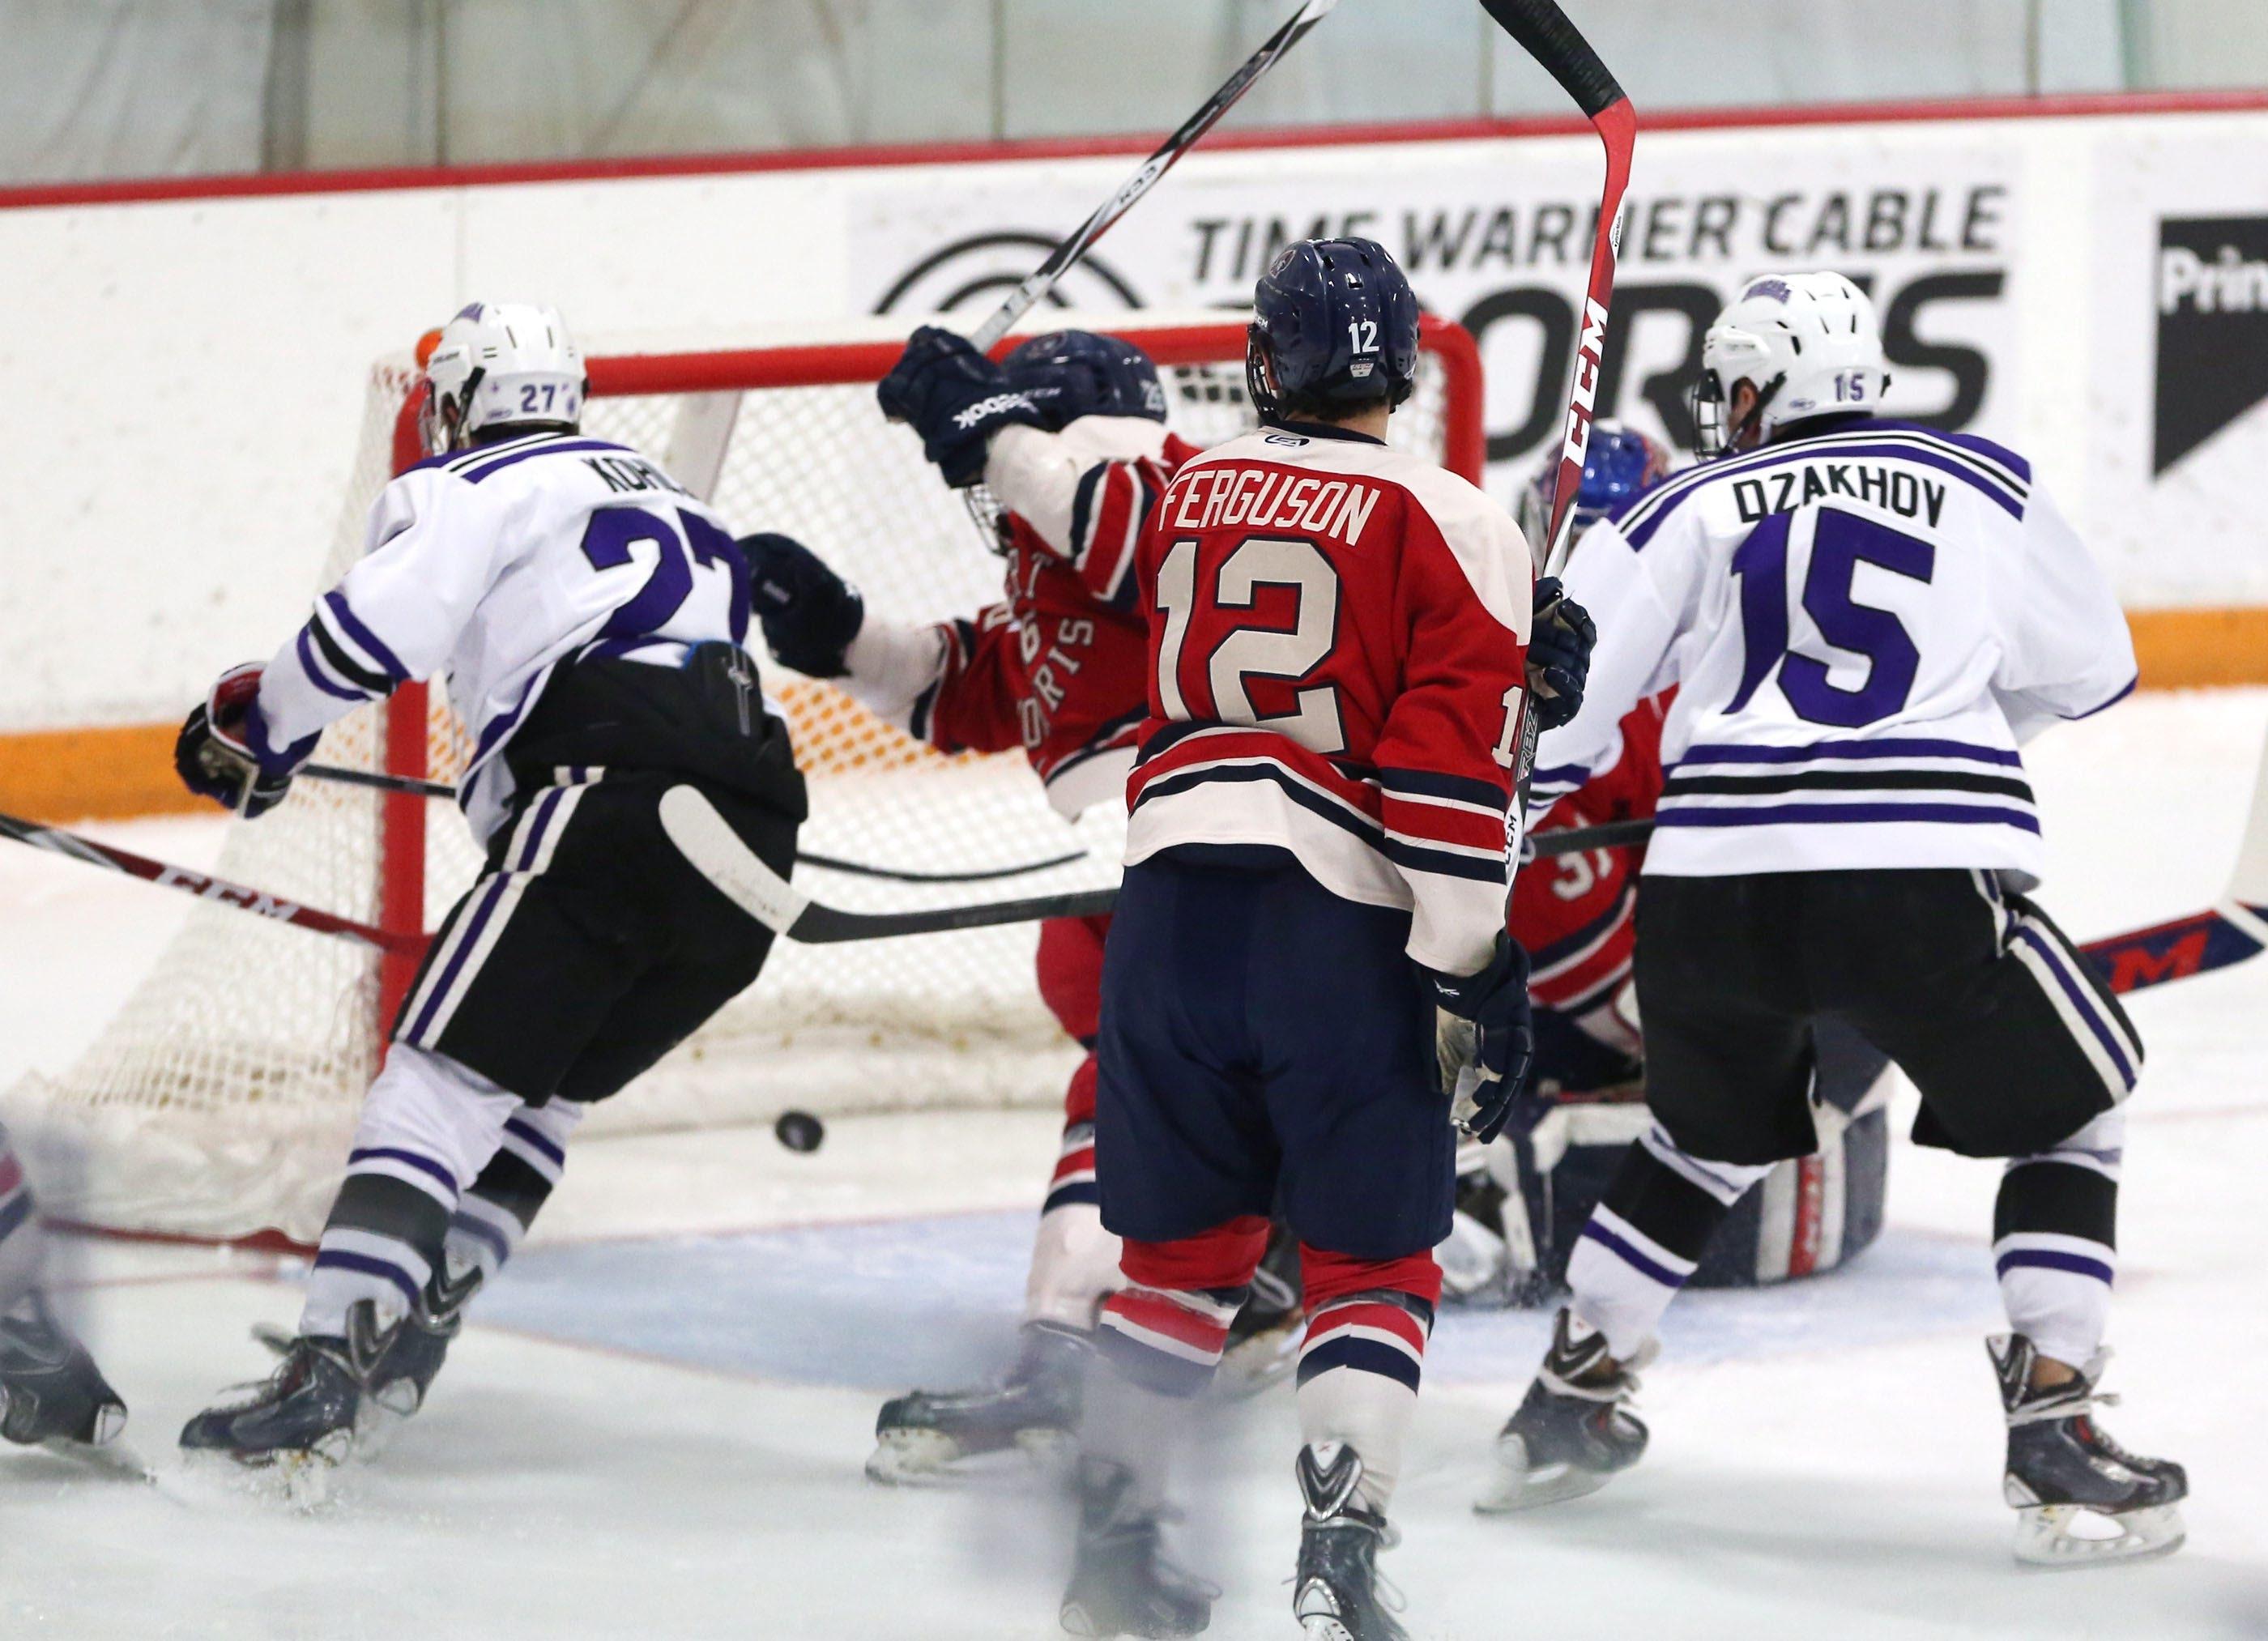 Niagara's Isaac Kohls scores one of his two goals against Robert Morris netminder Dalton Izyk.